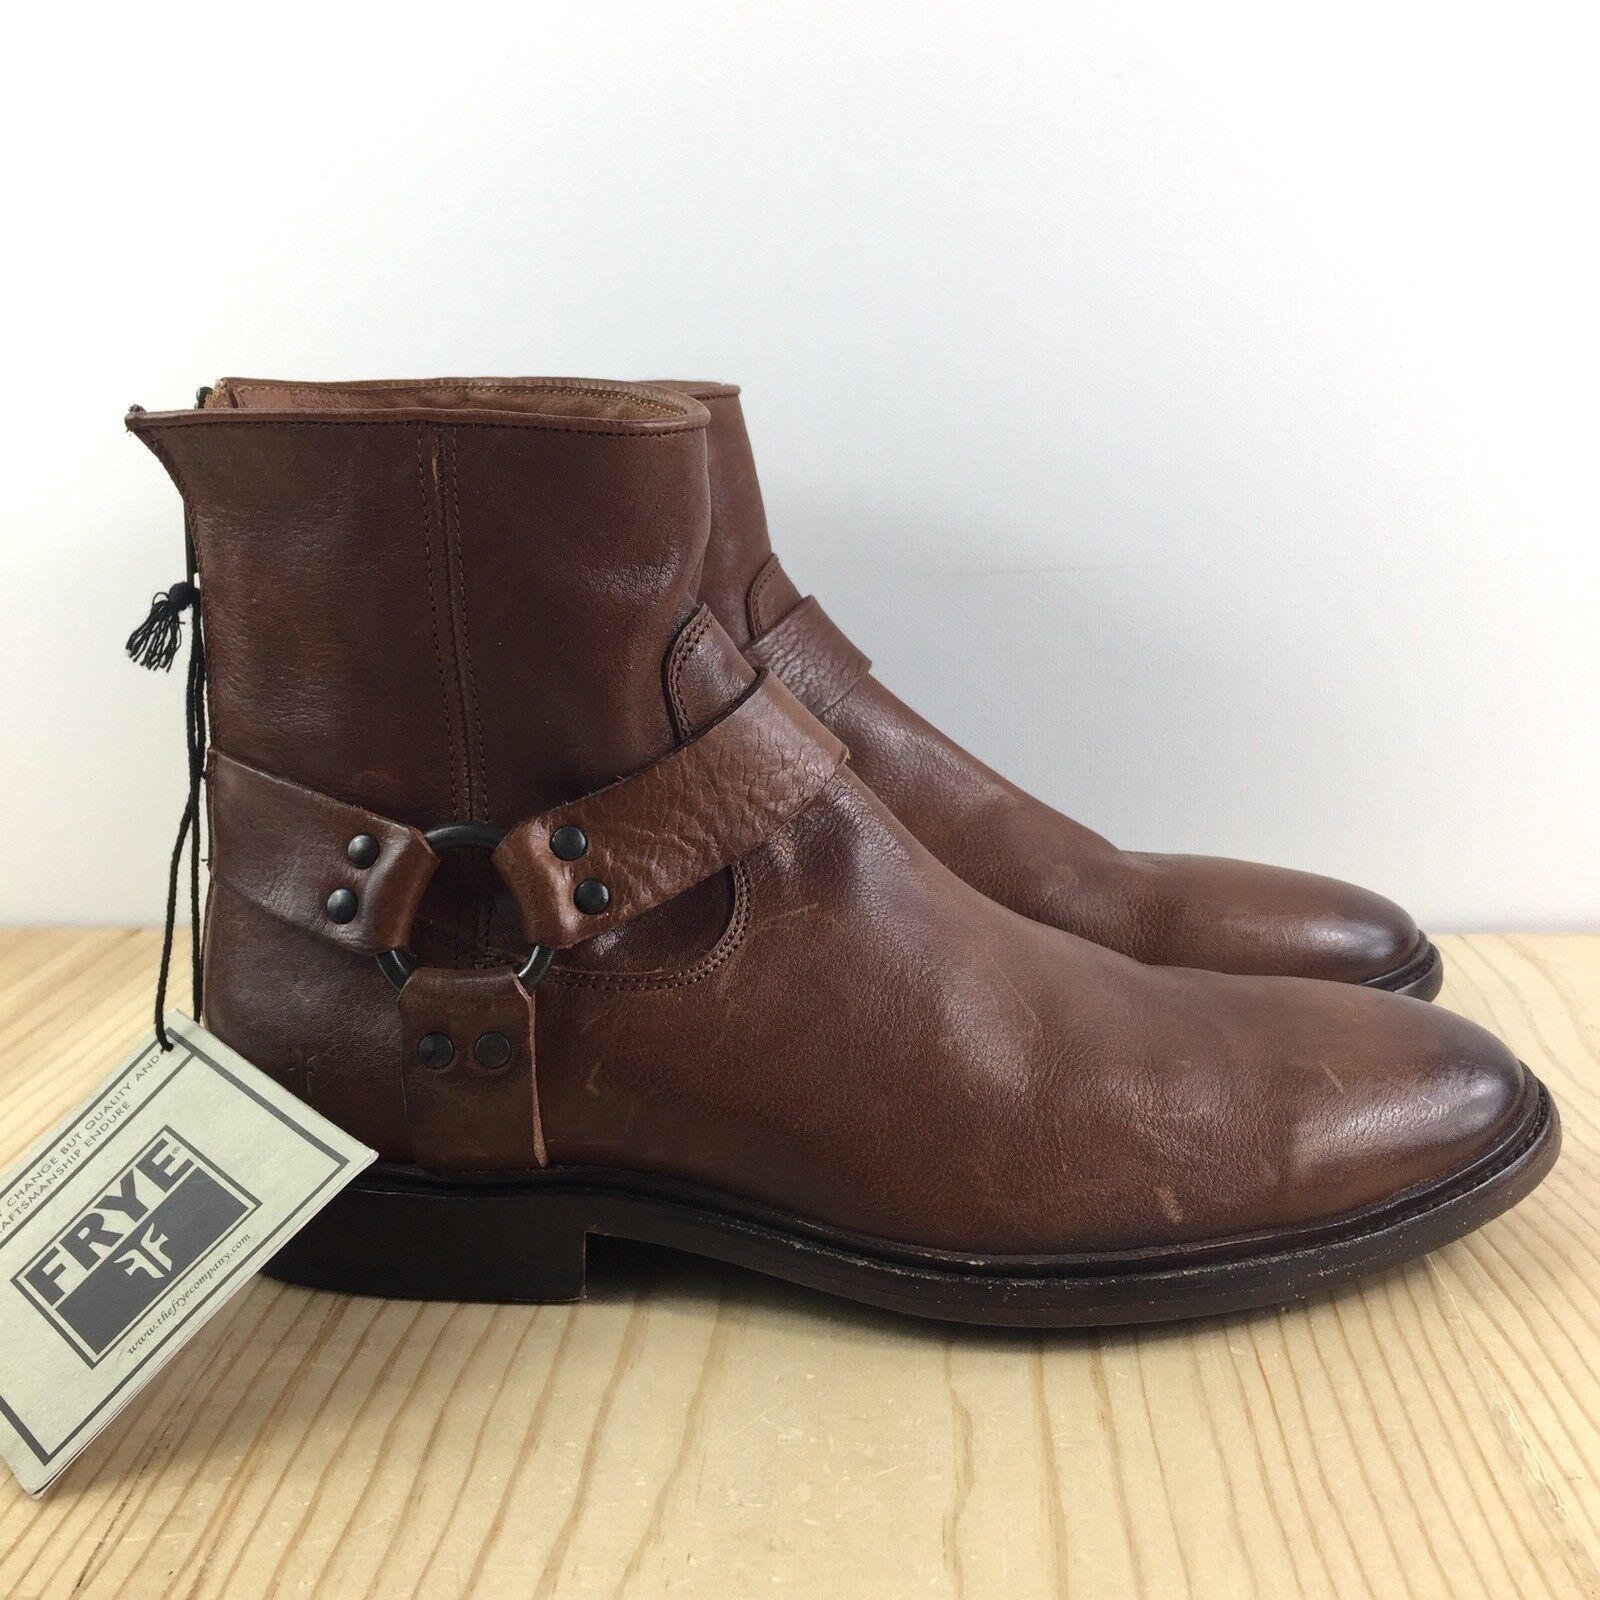 Frye Phillip Lug Harness Stivali Size 9 D Uomo Shoes